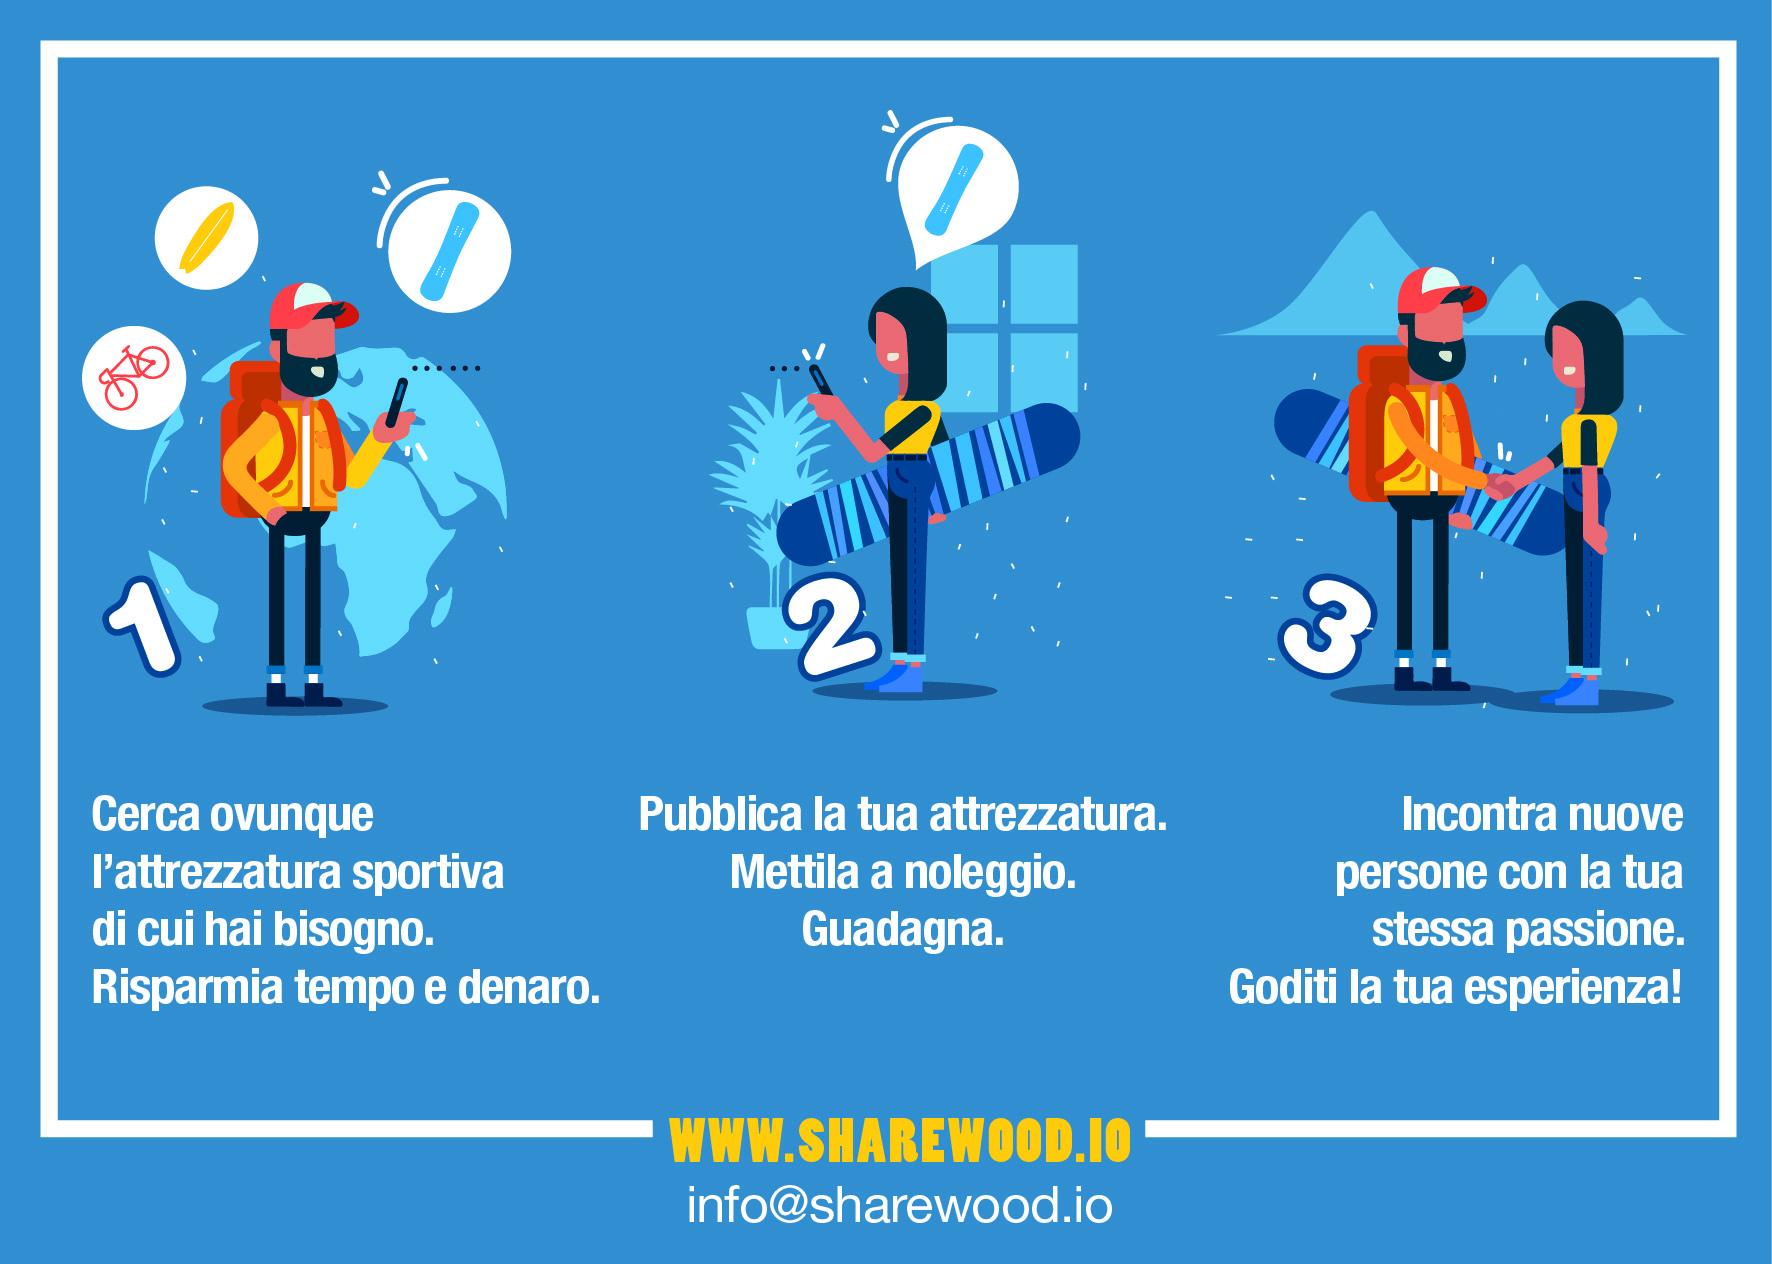 Come funziona Sharewood